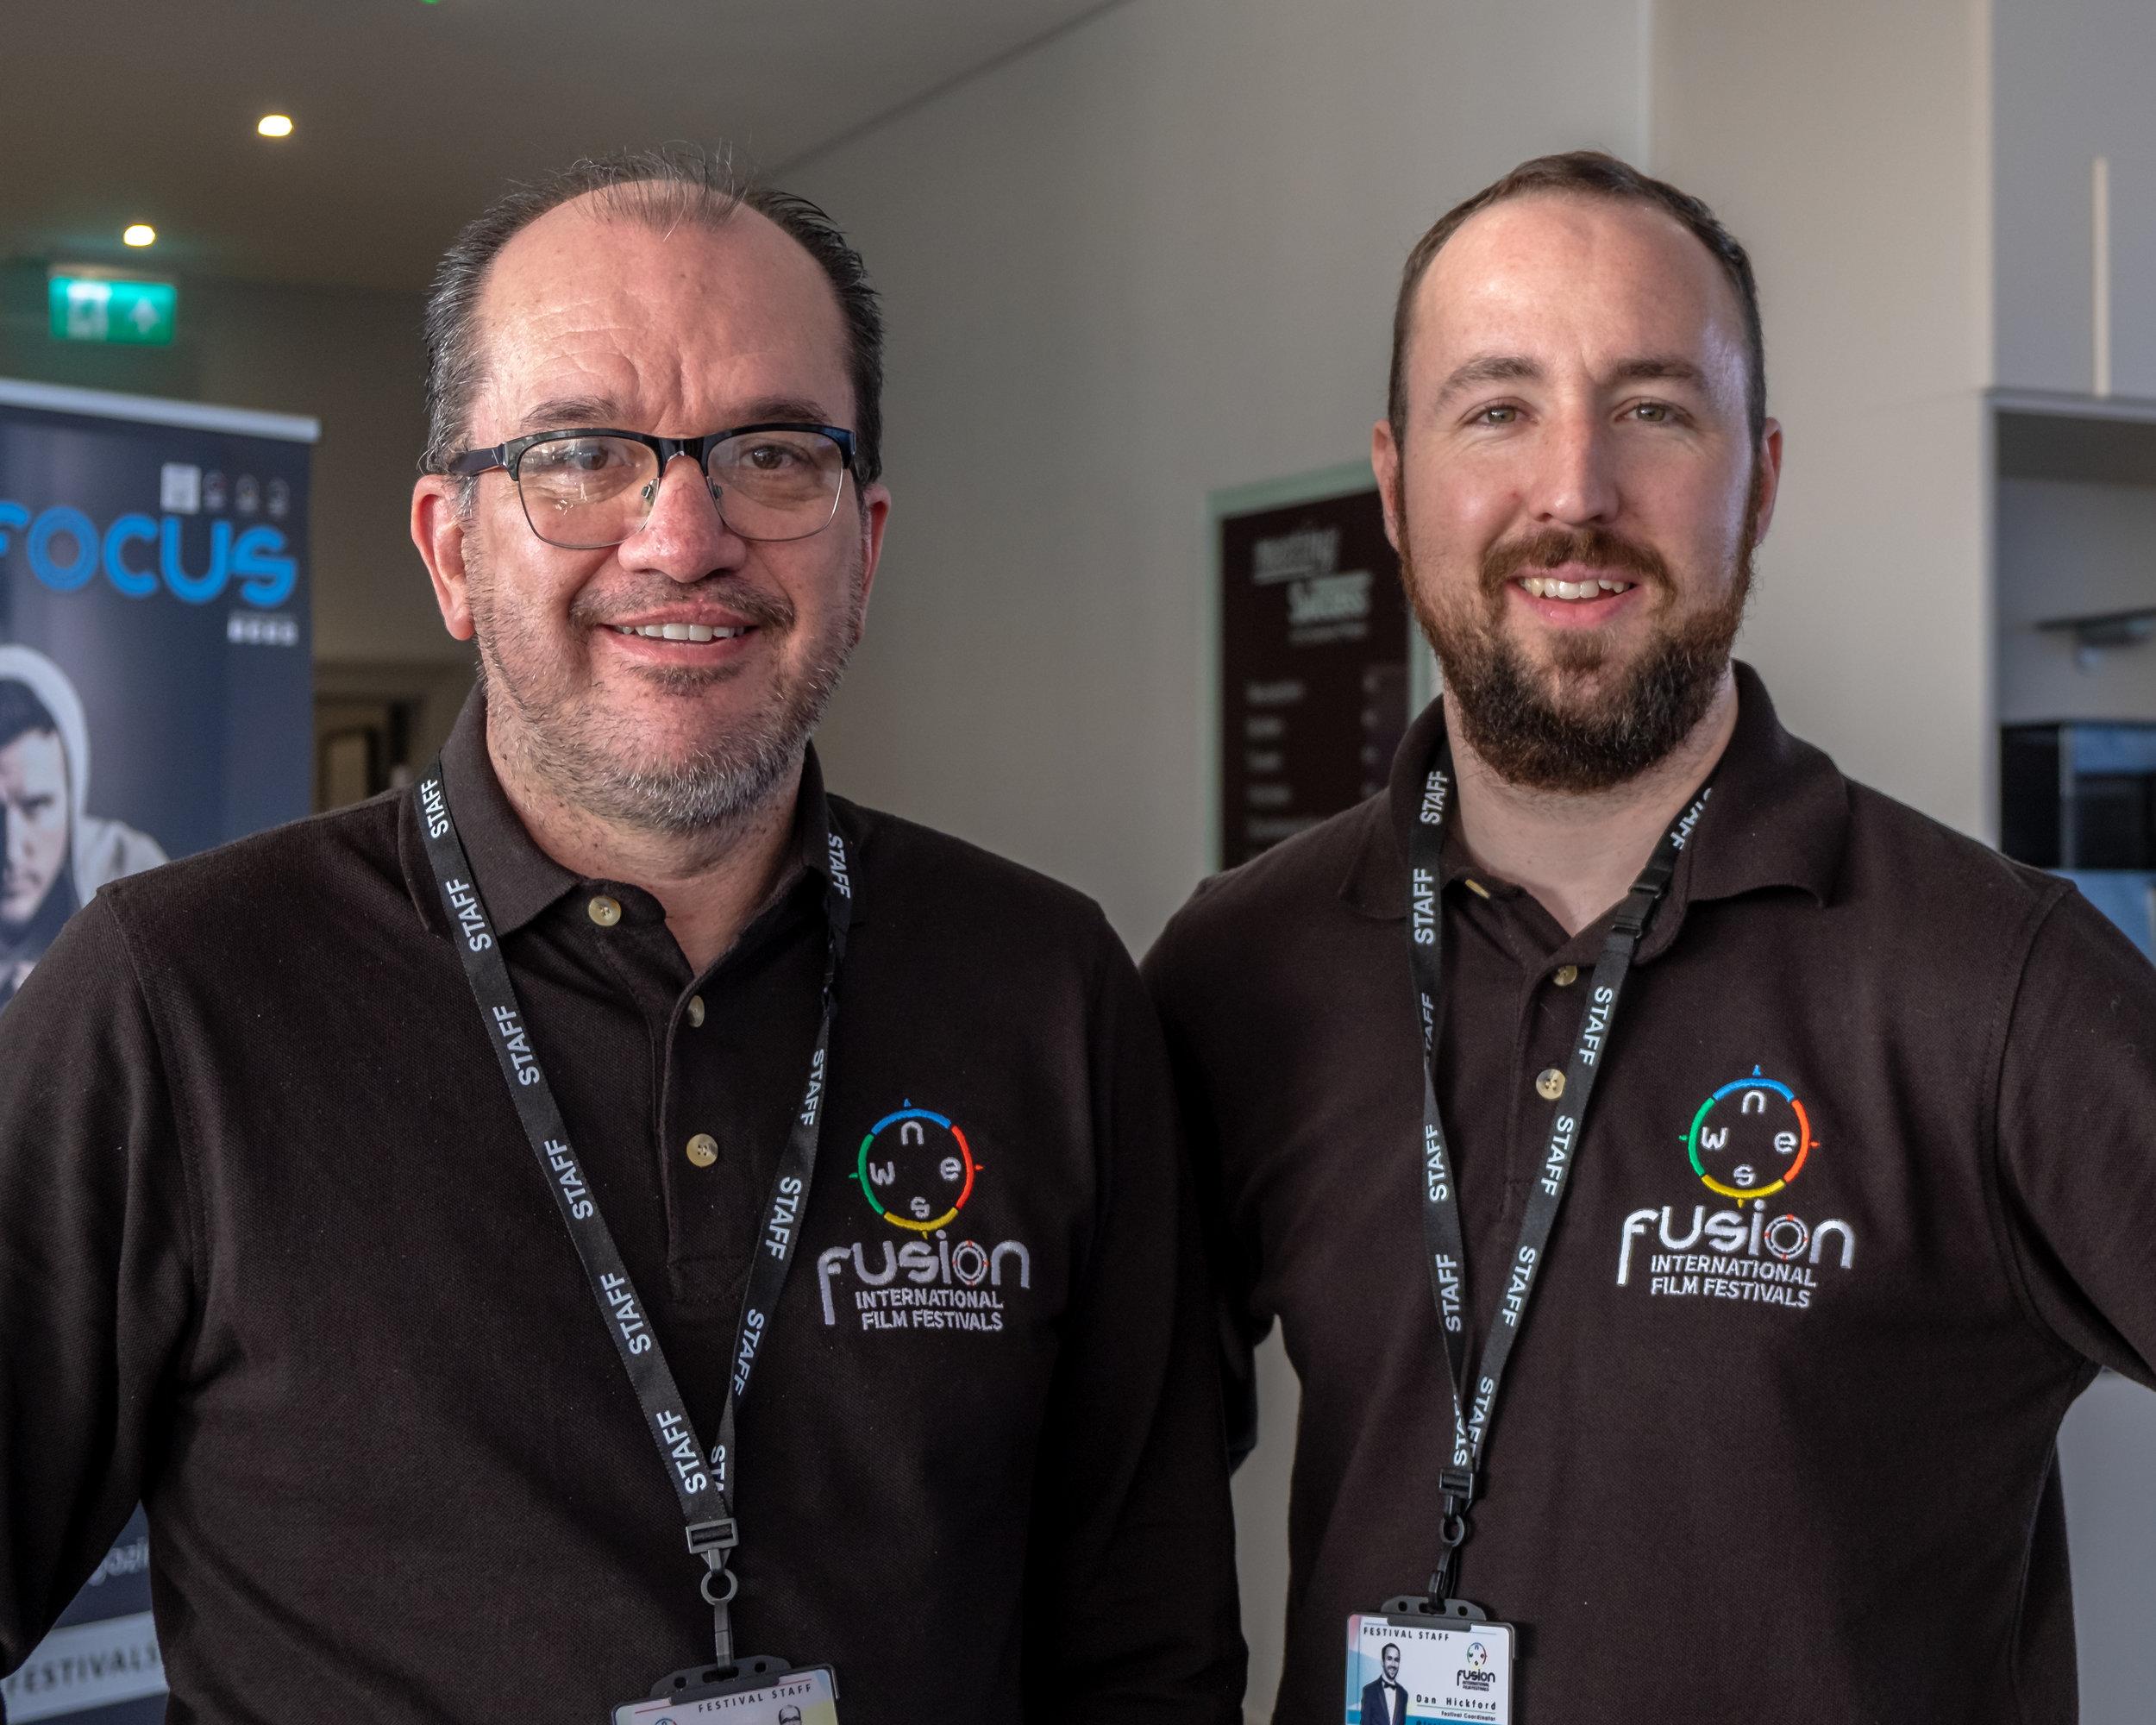 Steve Grossmith and Dan Hickford at the North Europe International Film Festival in London on February 22, 2019    Courtesy of Stuart Watson